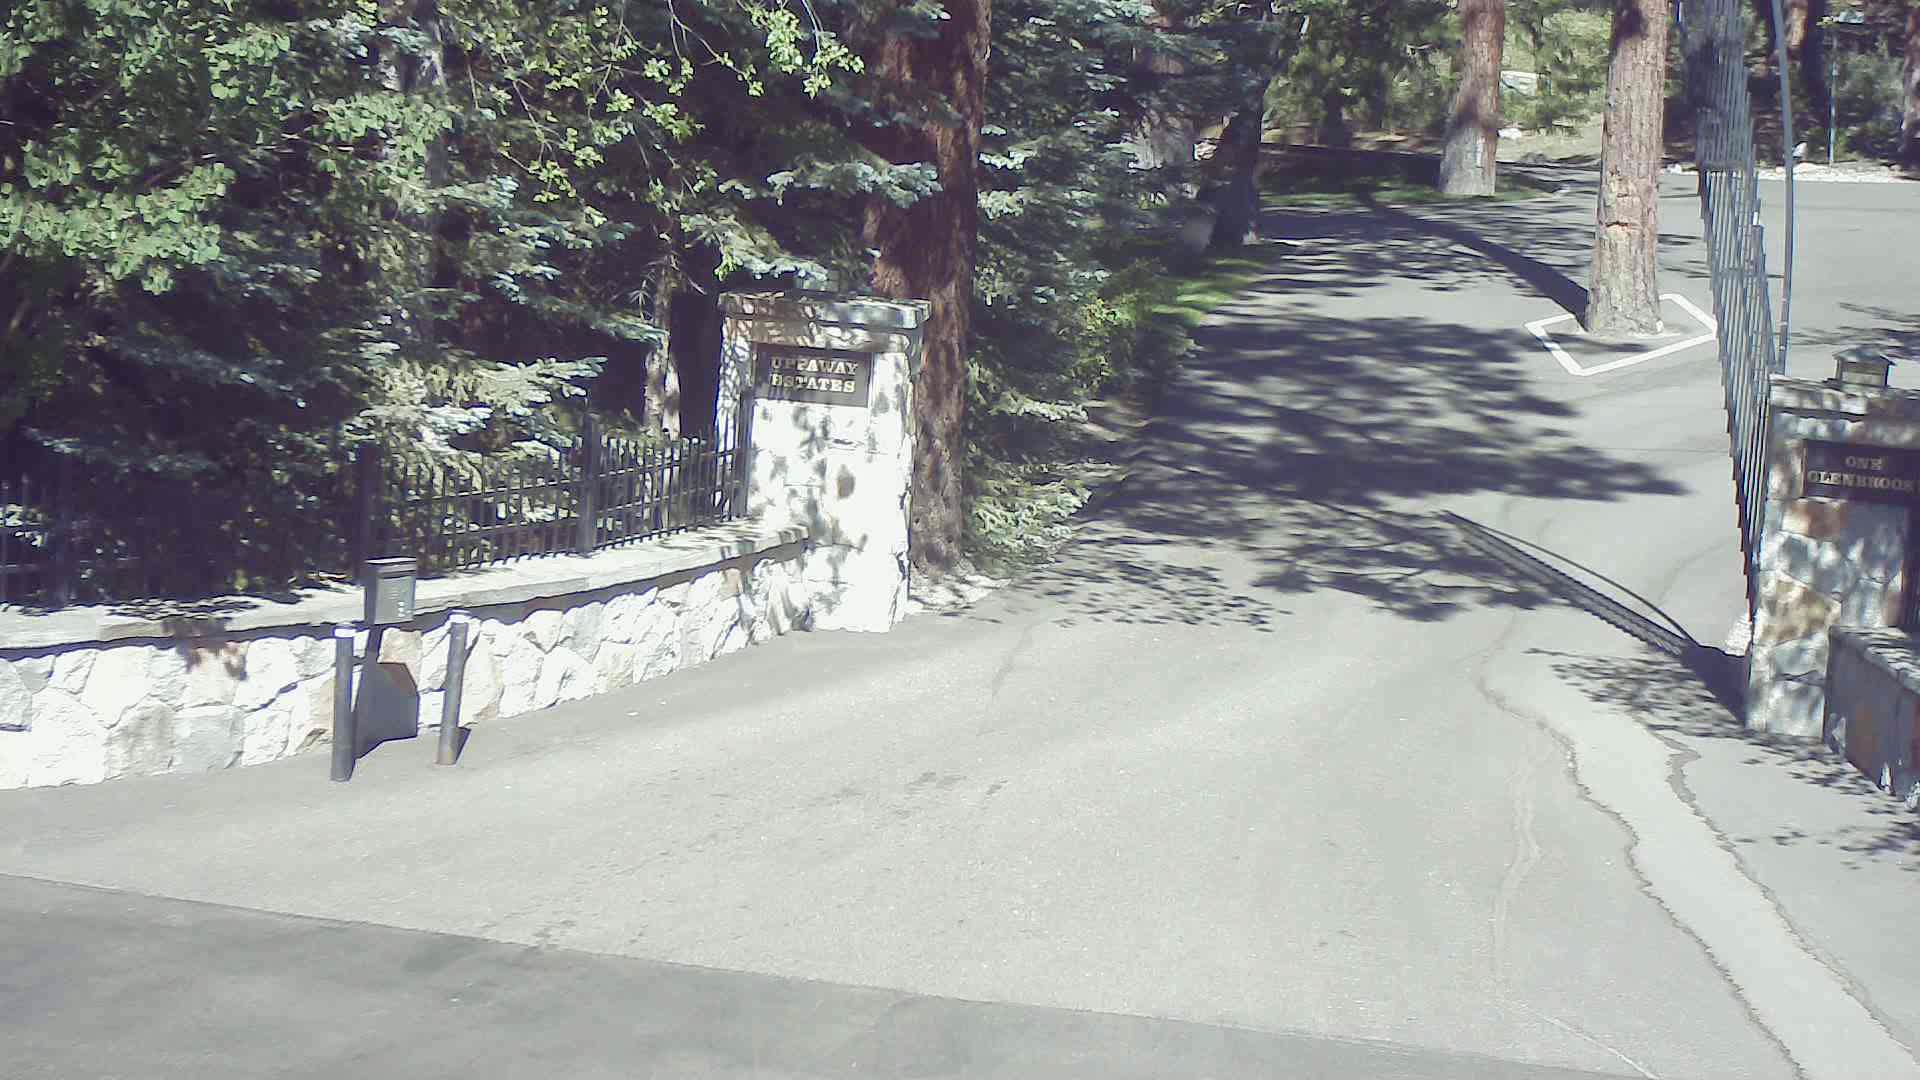 1759 Uppaway Gate @ 6/23/2021 4:50:00 PM